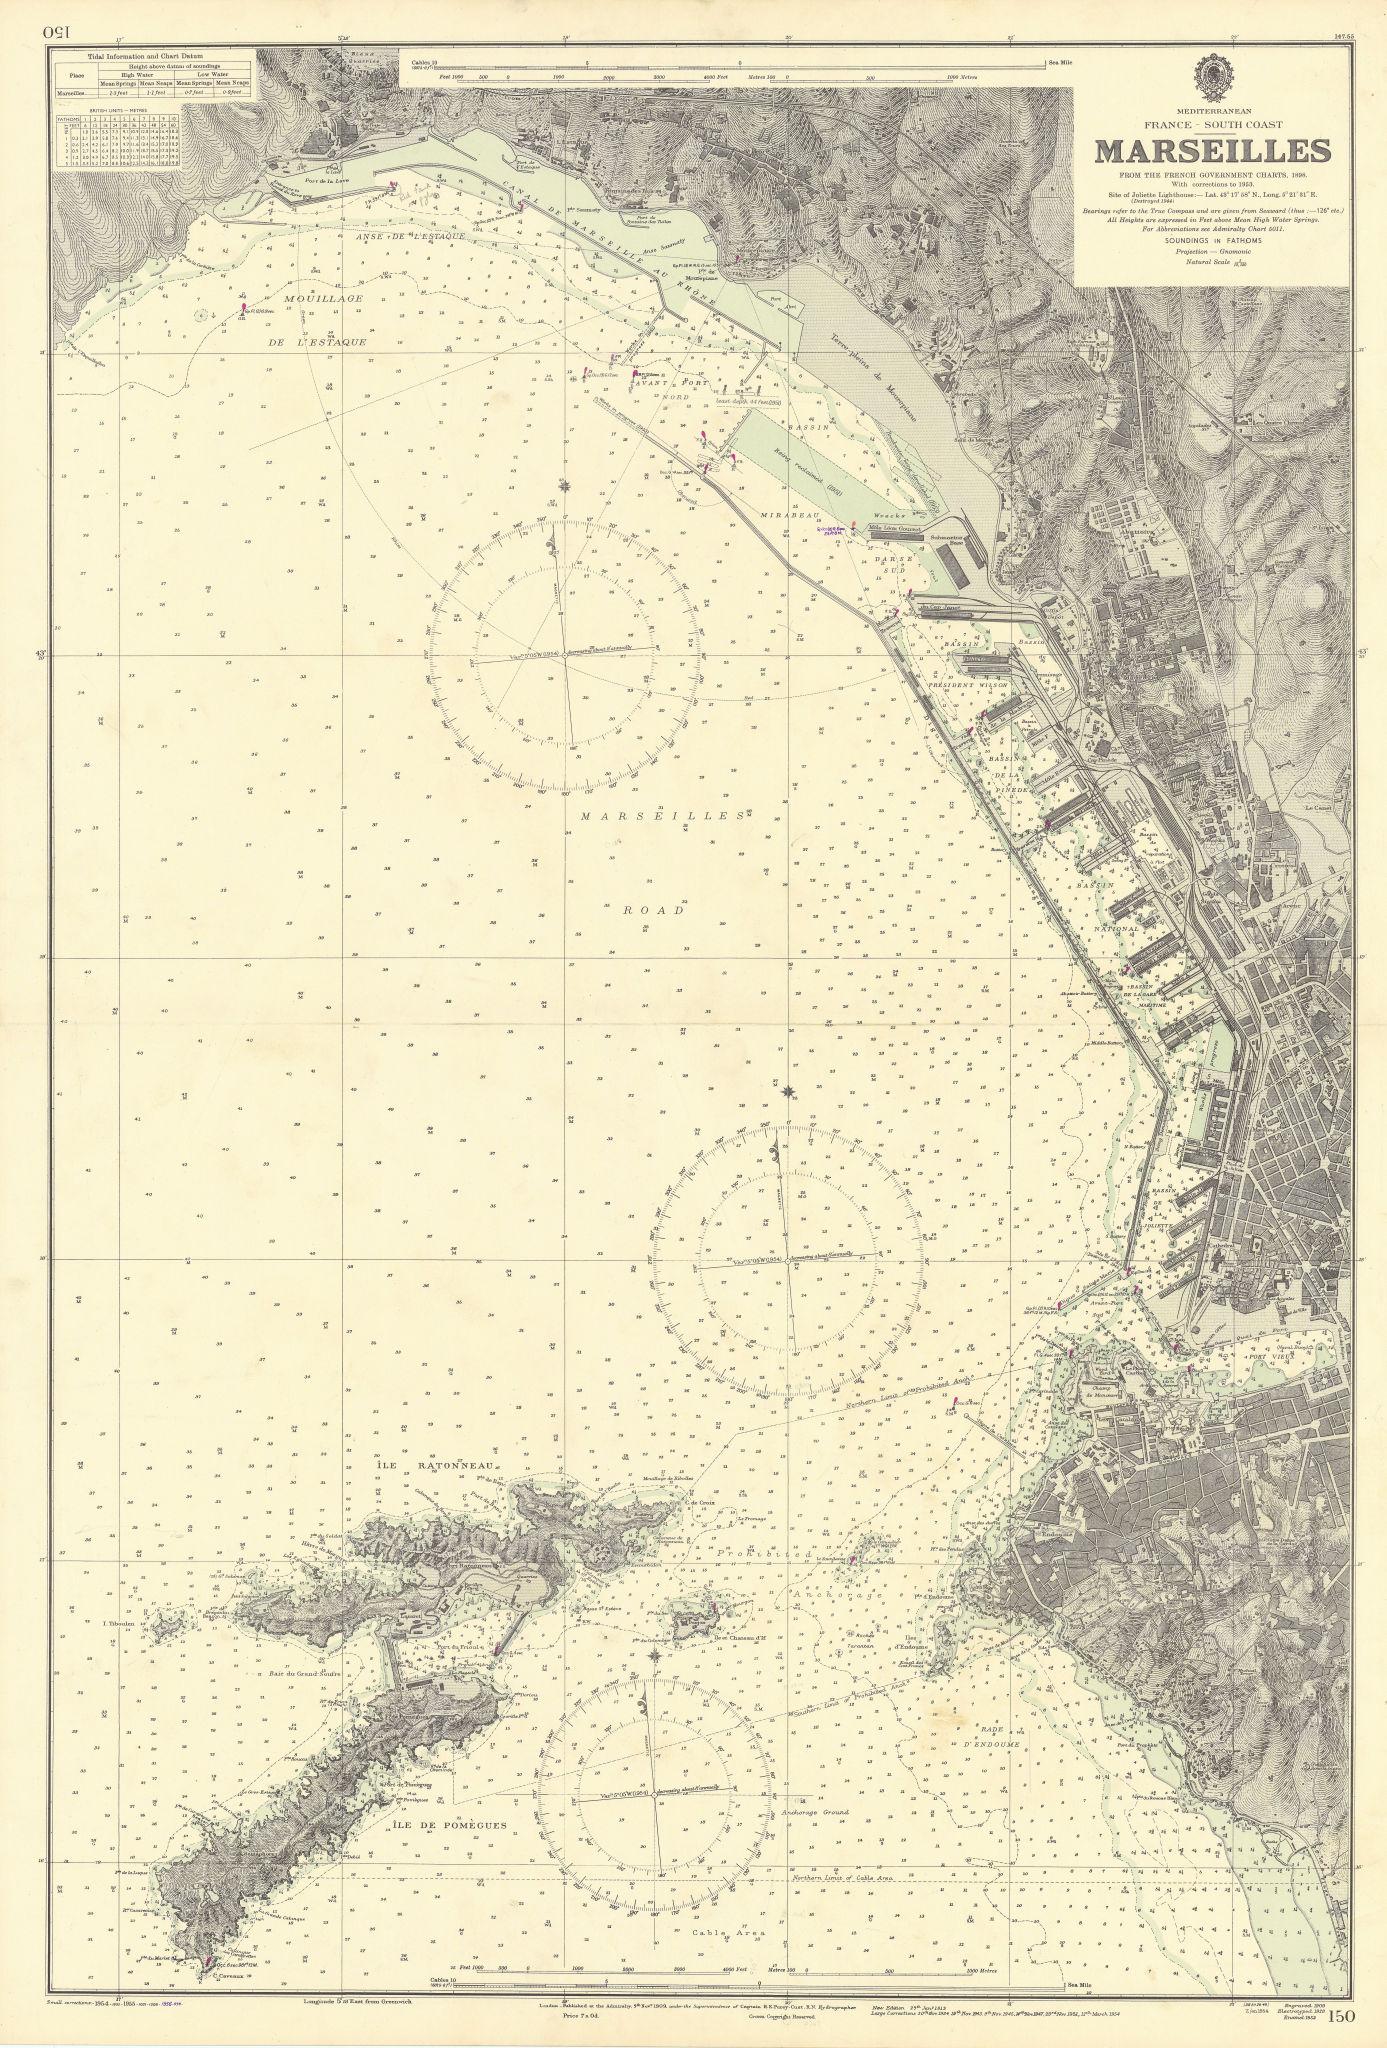 Marseilles port. Bouches-du-Rhône. ADMIRALTY sea chart 1909 (1956) old map